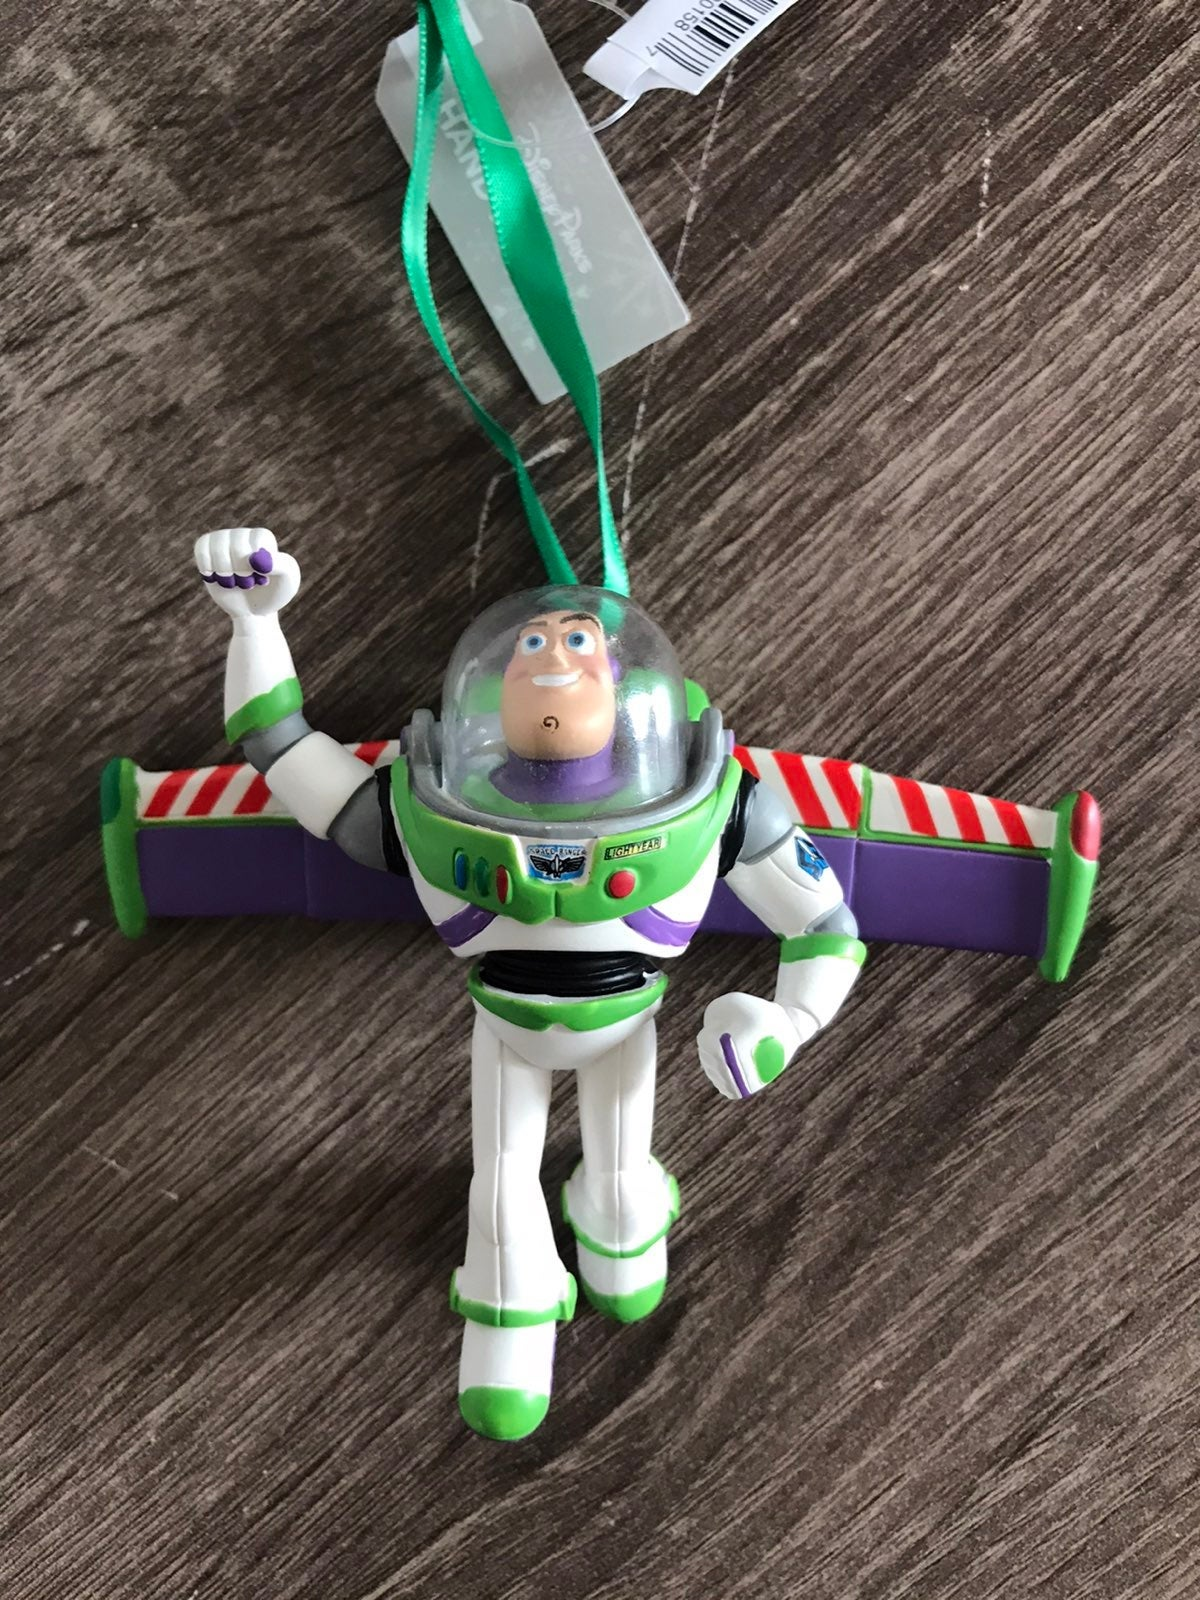 Buzz Lightyear Disney Christmas Ornament